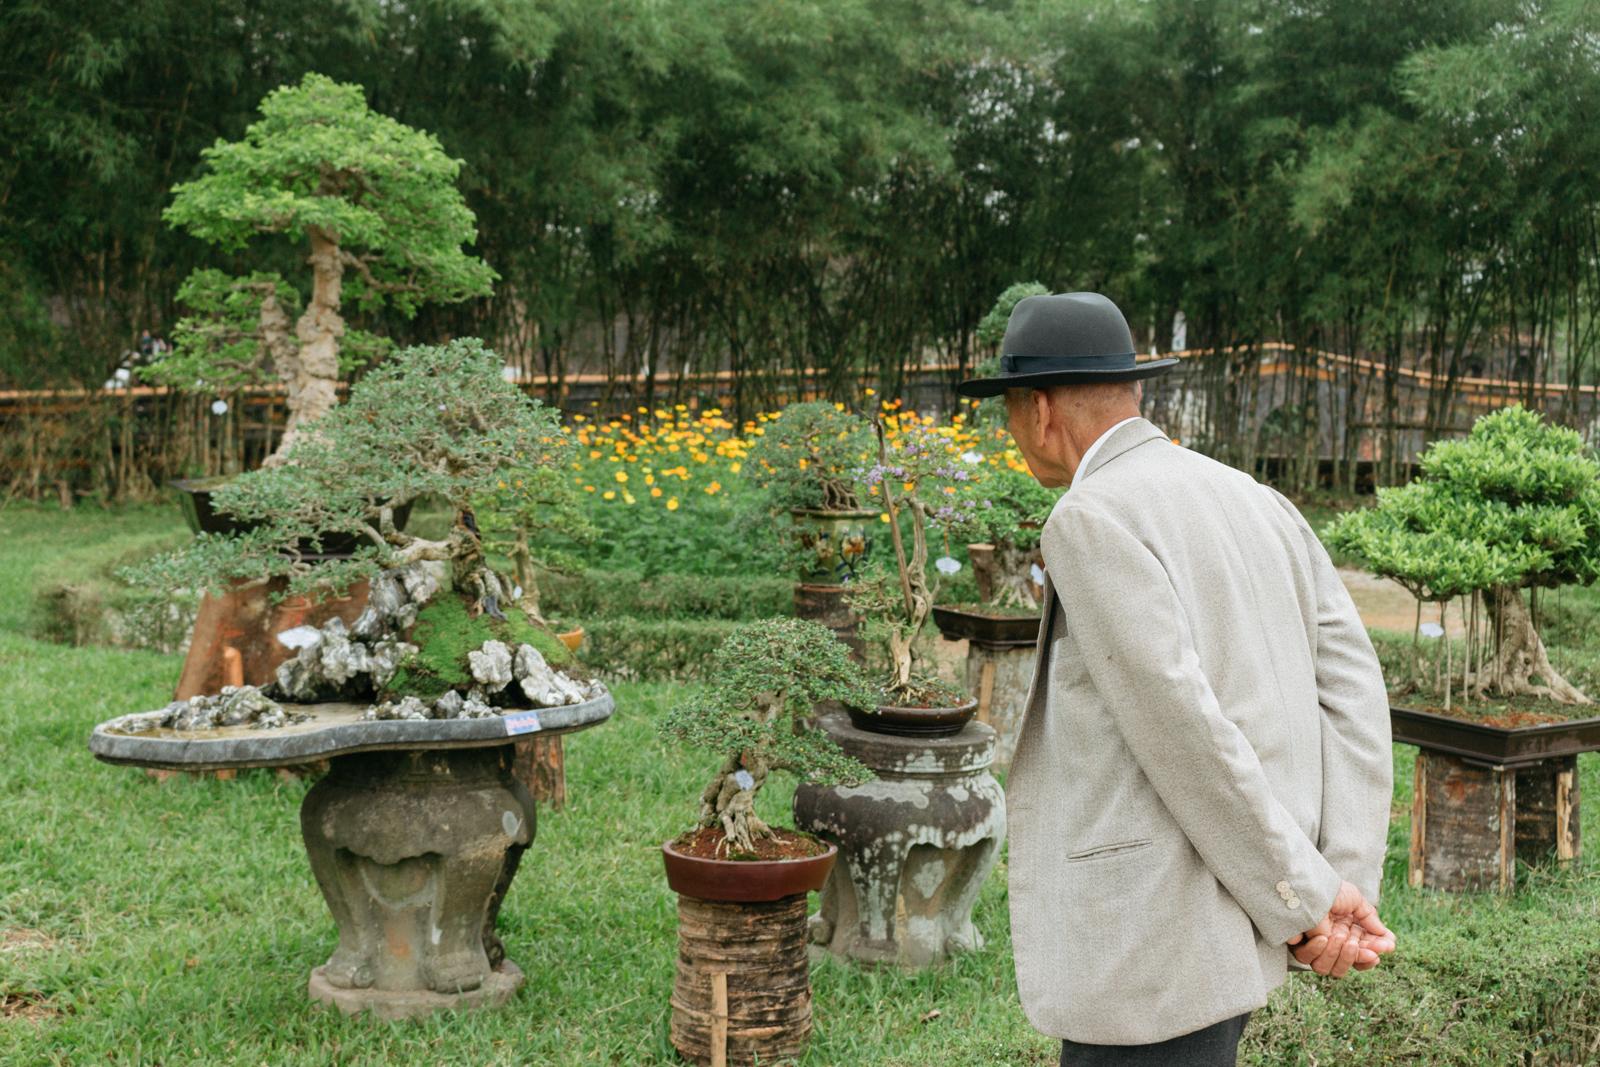 Vietnam S Tradition Of Beautiful Bonsai Tree Art